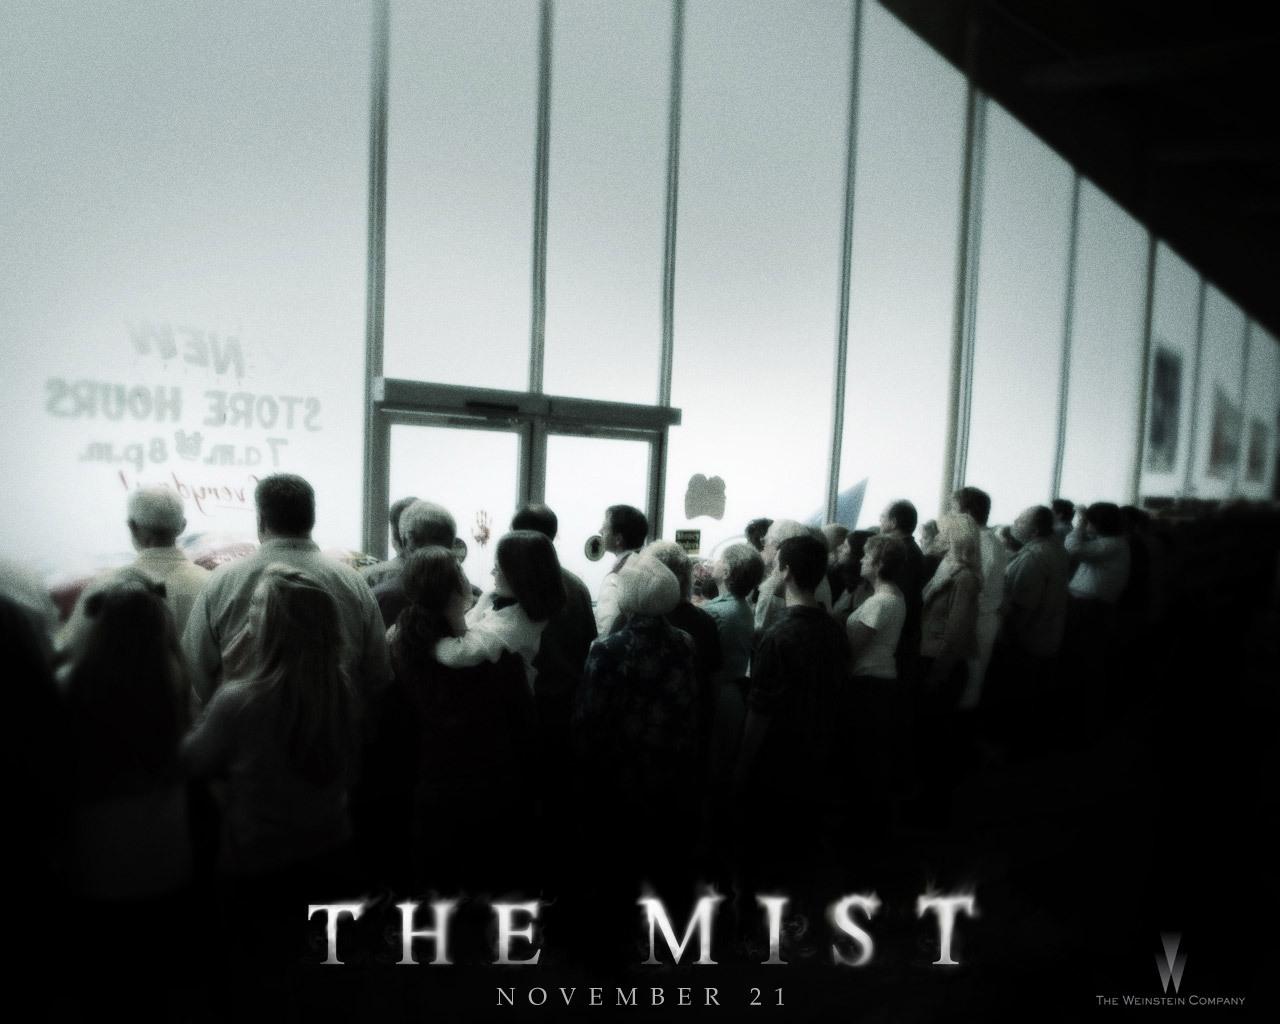 Film Blog: The Mist (2007)